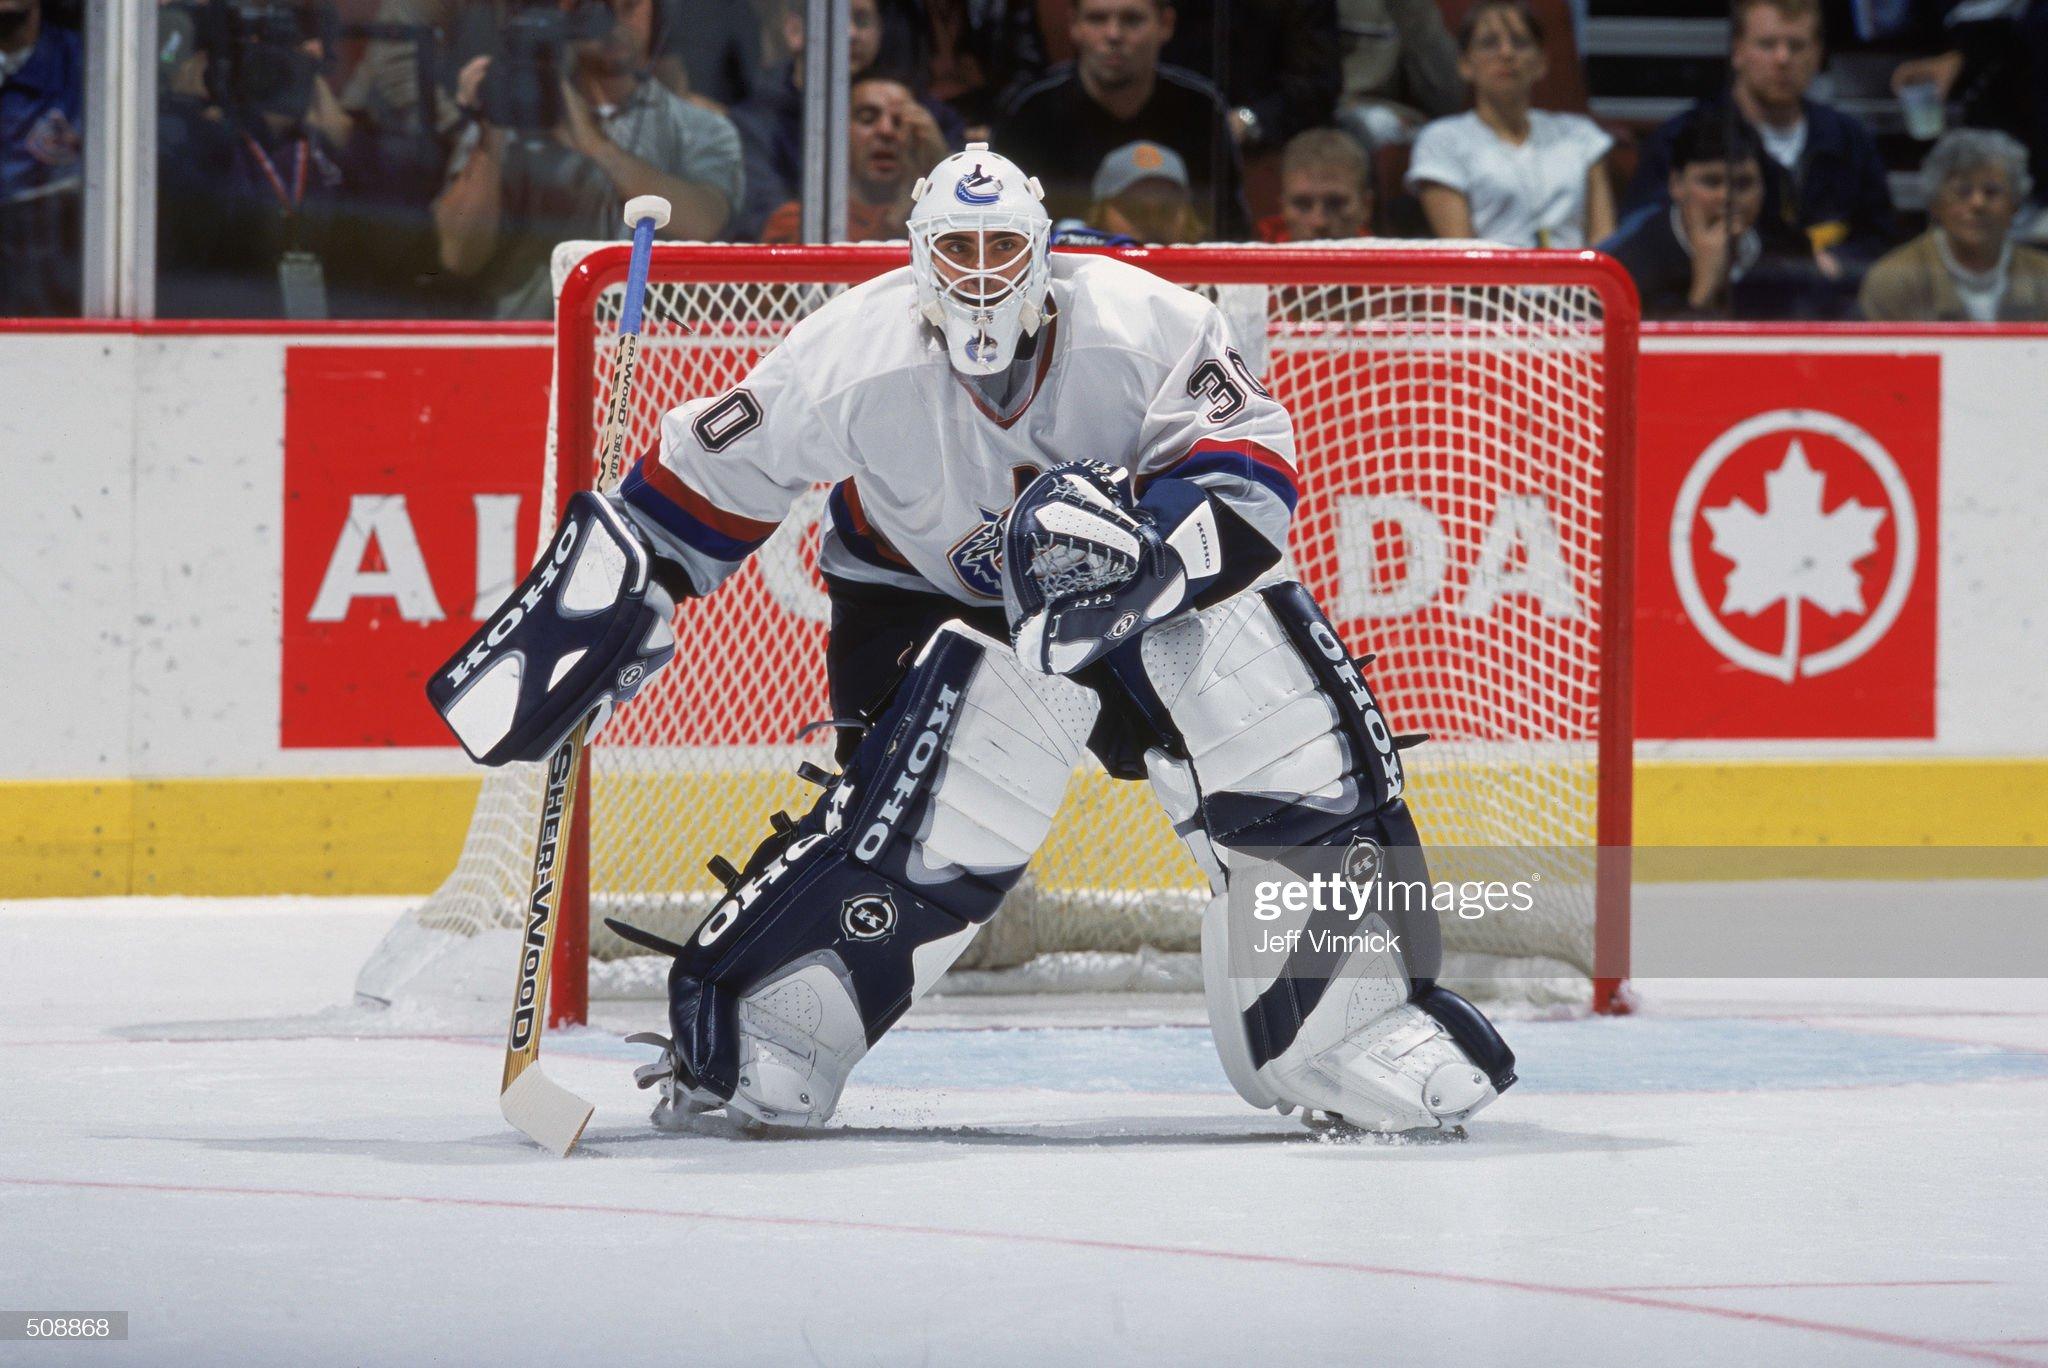 oct-2001-goaltender-martin-brochu-of-the